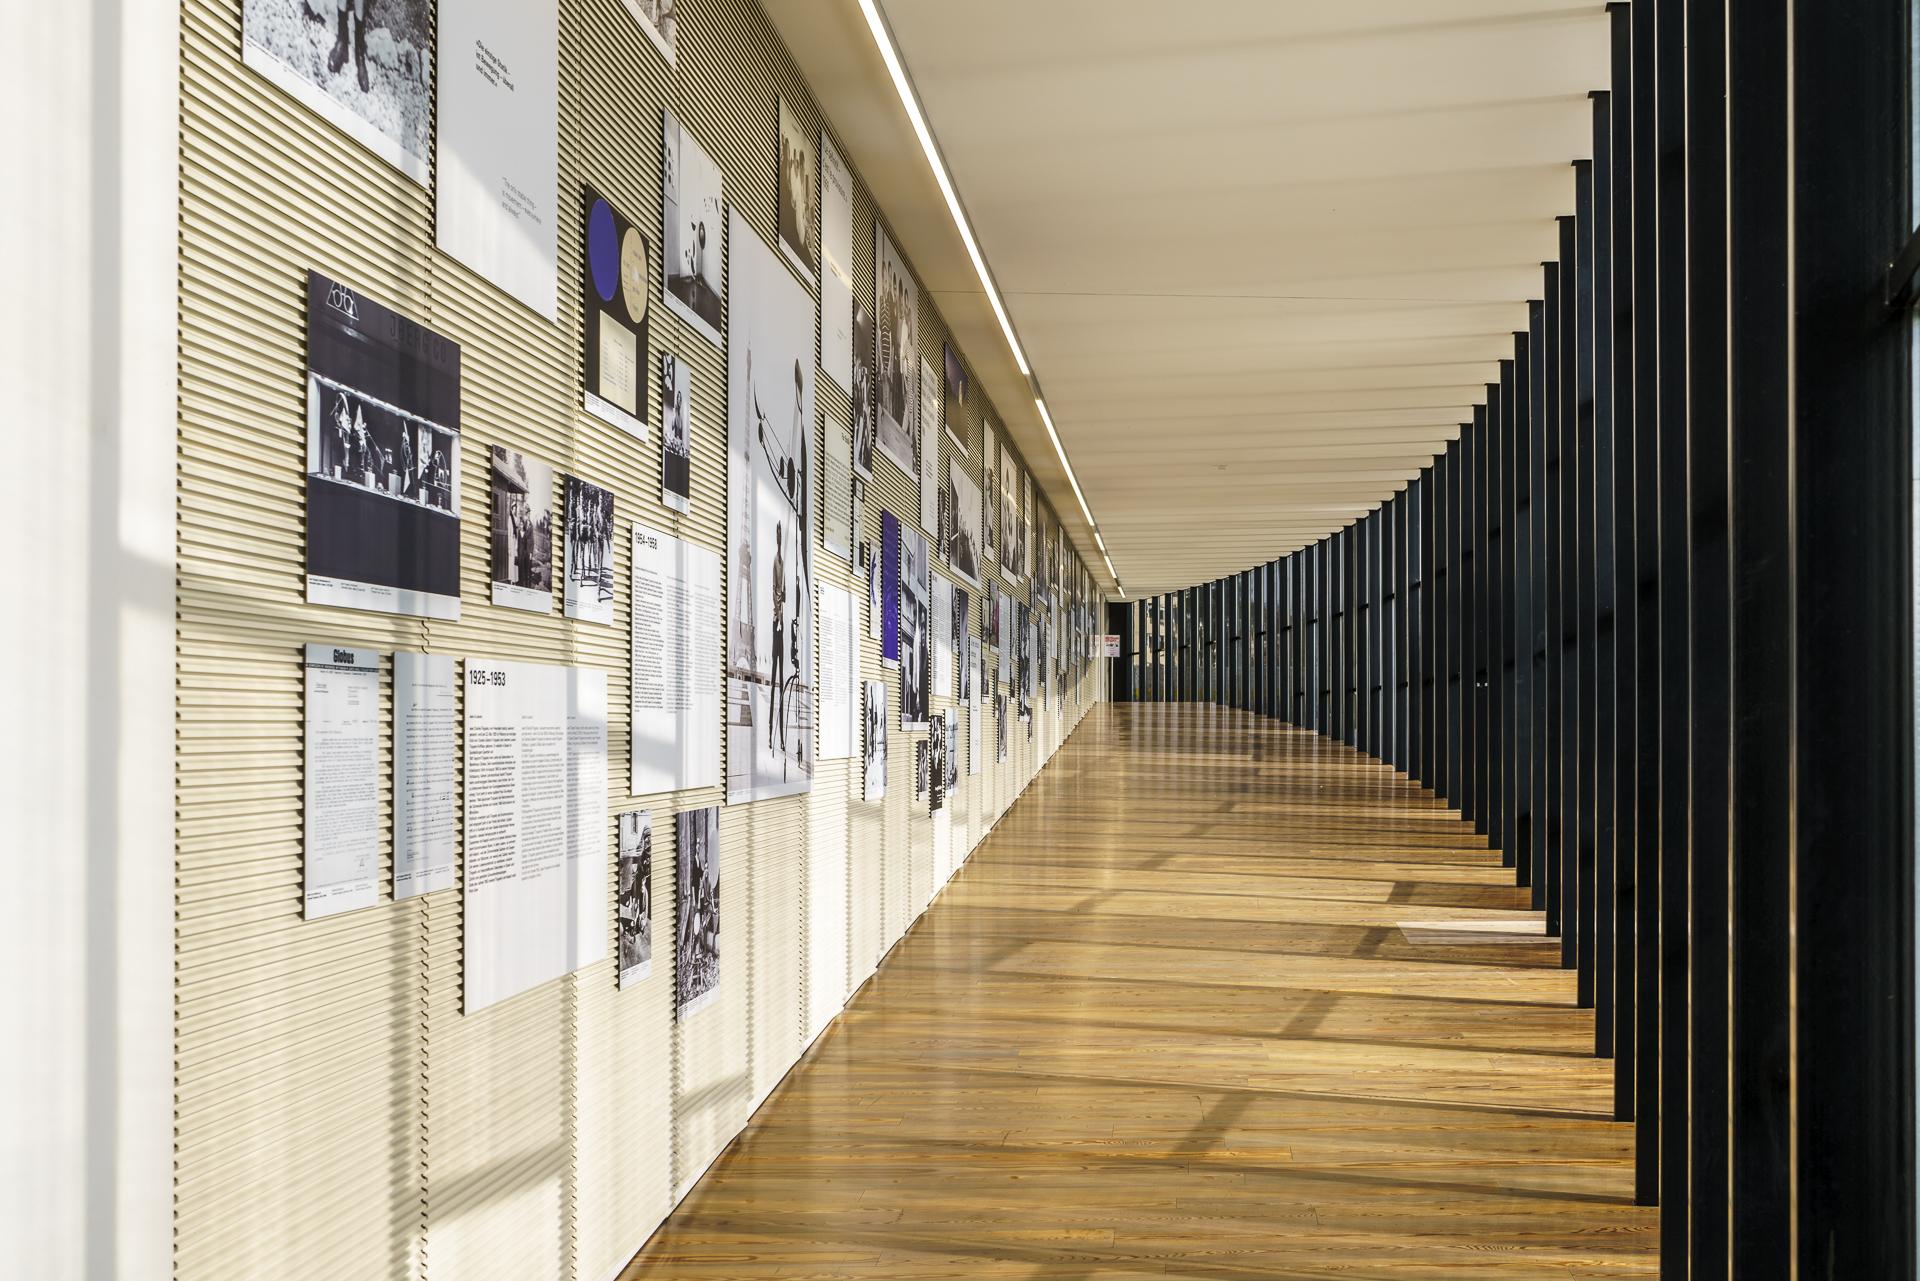 Tinguelymuseum Basel Architektur